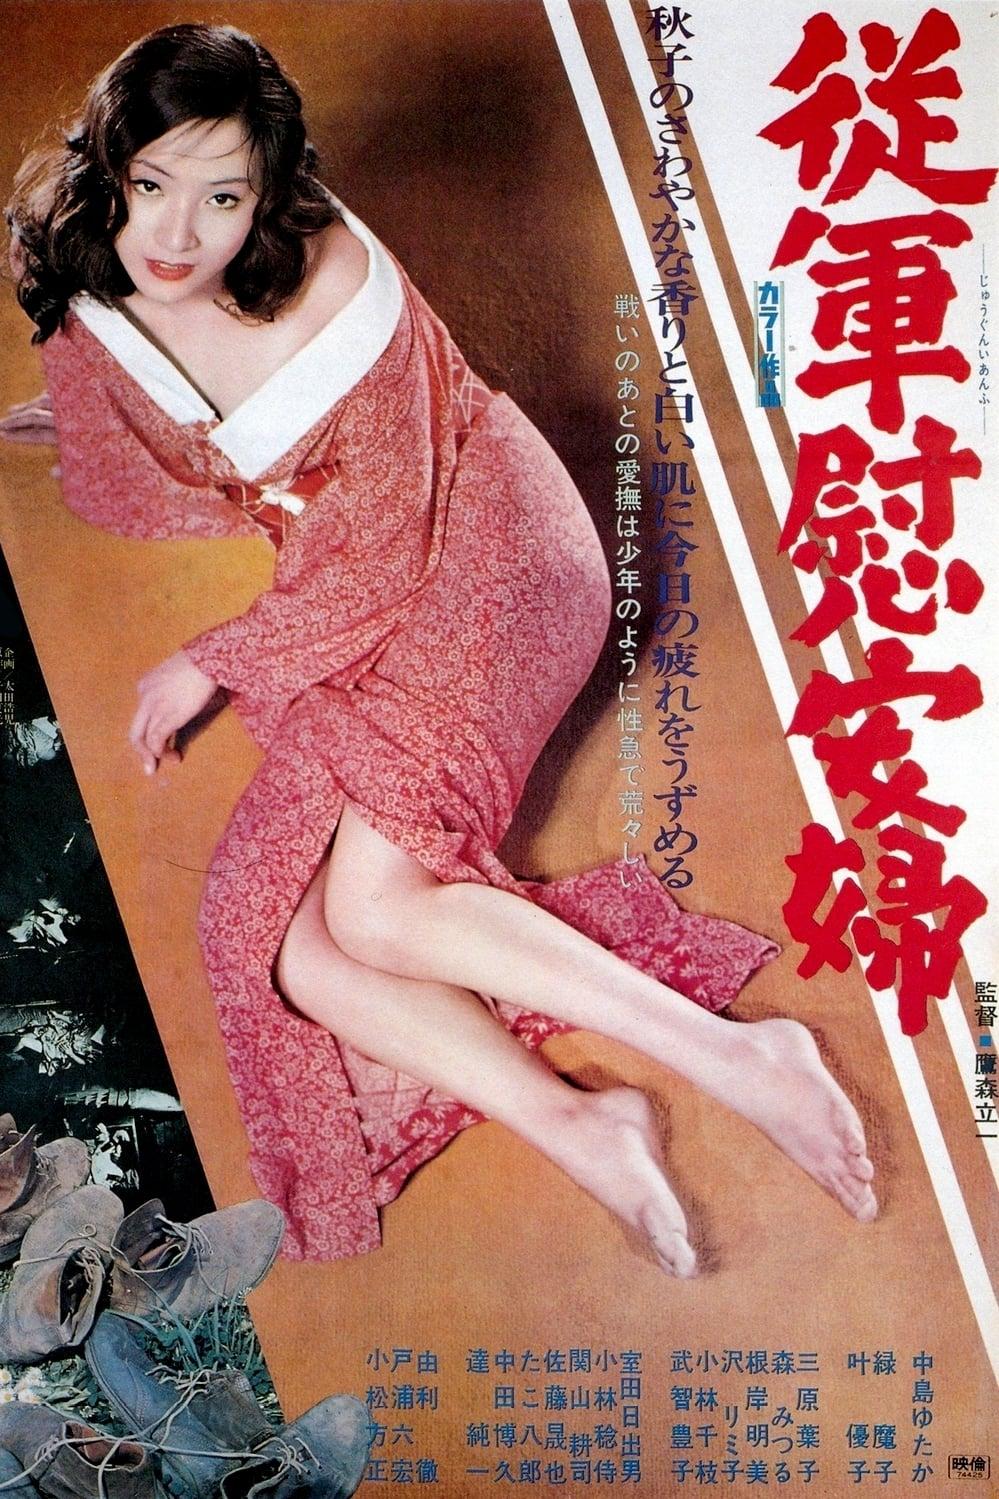 Military Comfort Woman